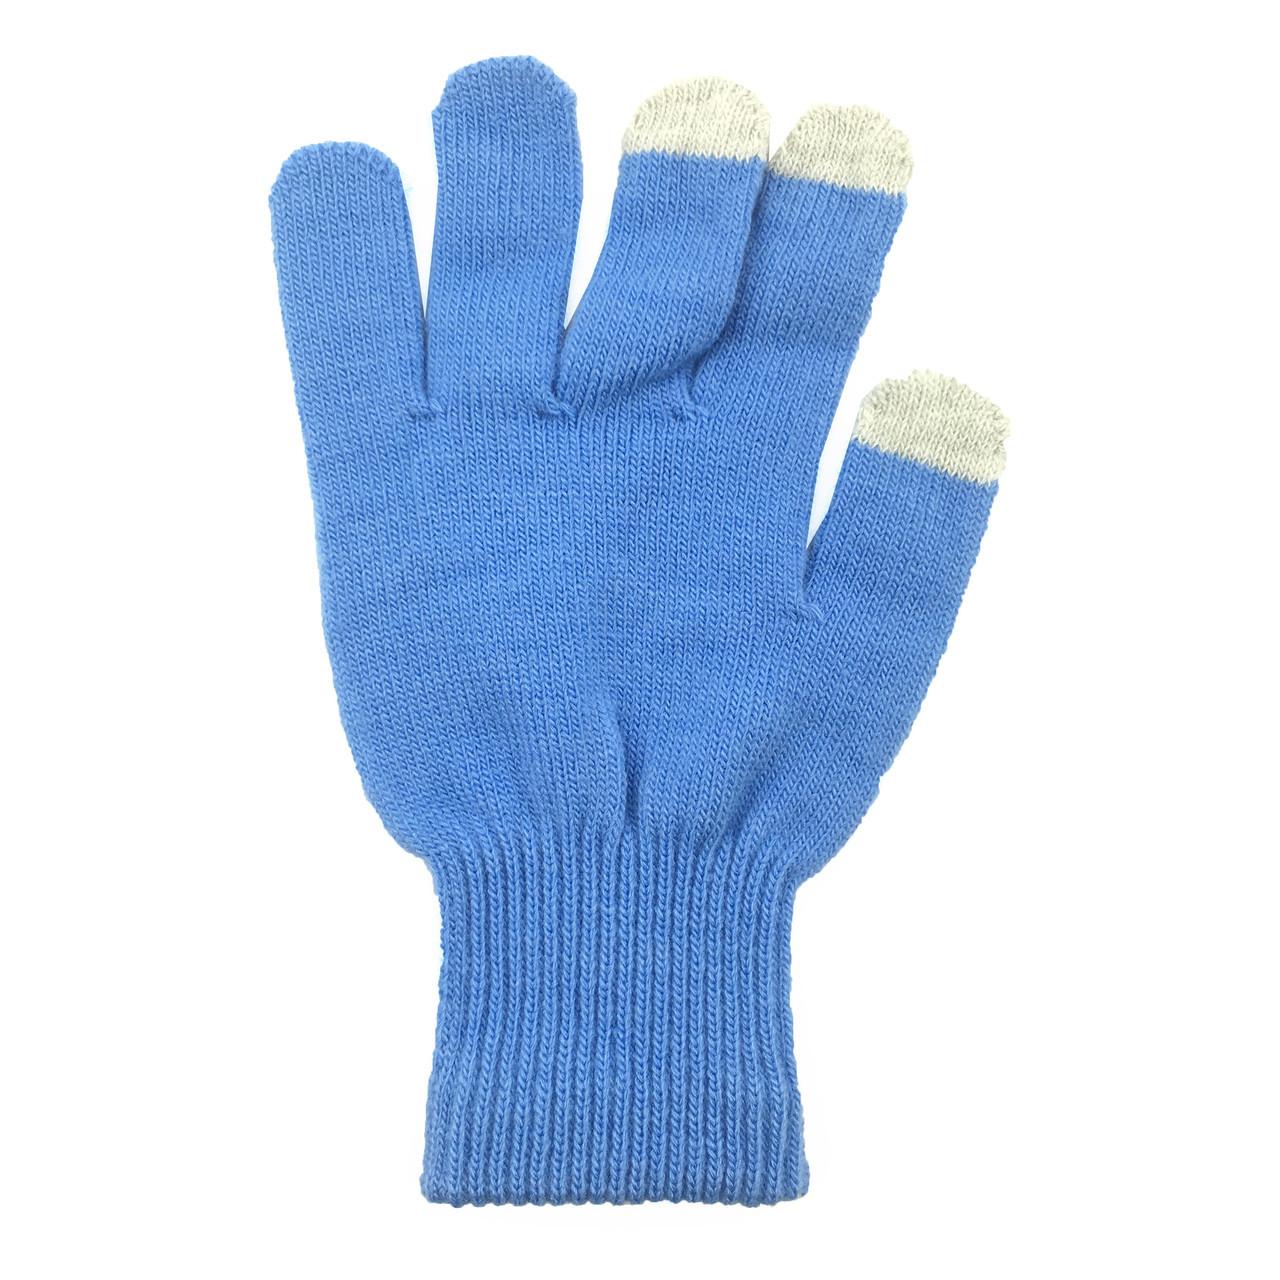 ✅ Перчатки iTouch для сенсорных экранов Sky blue